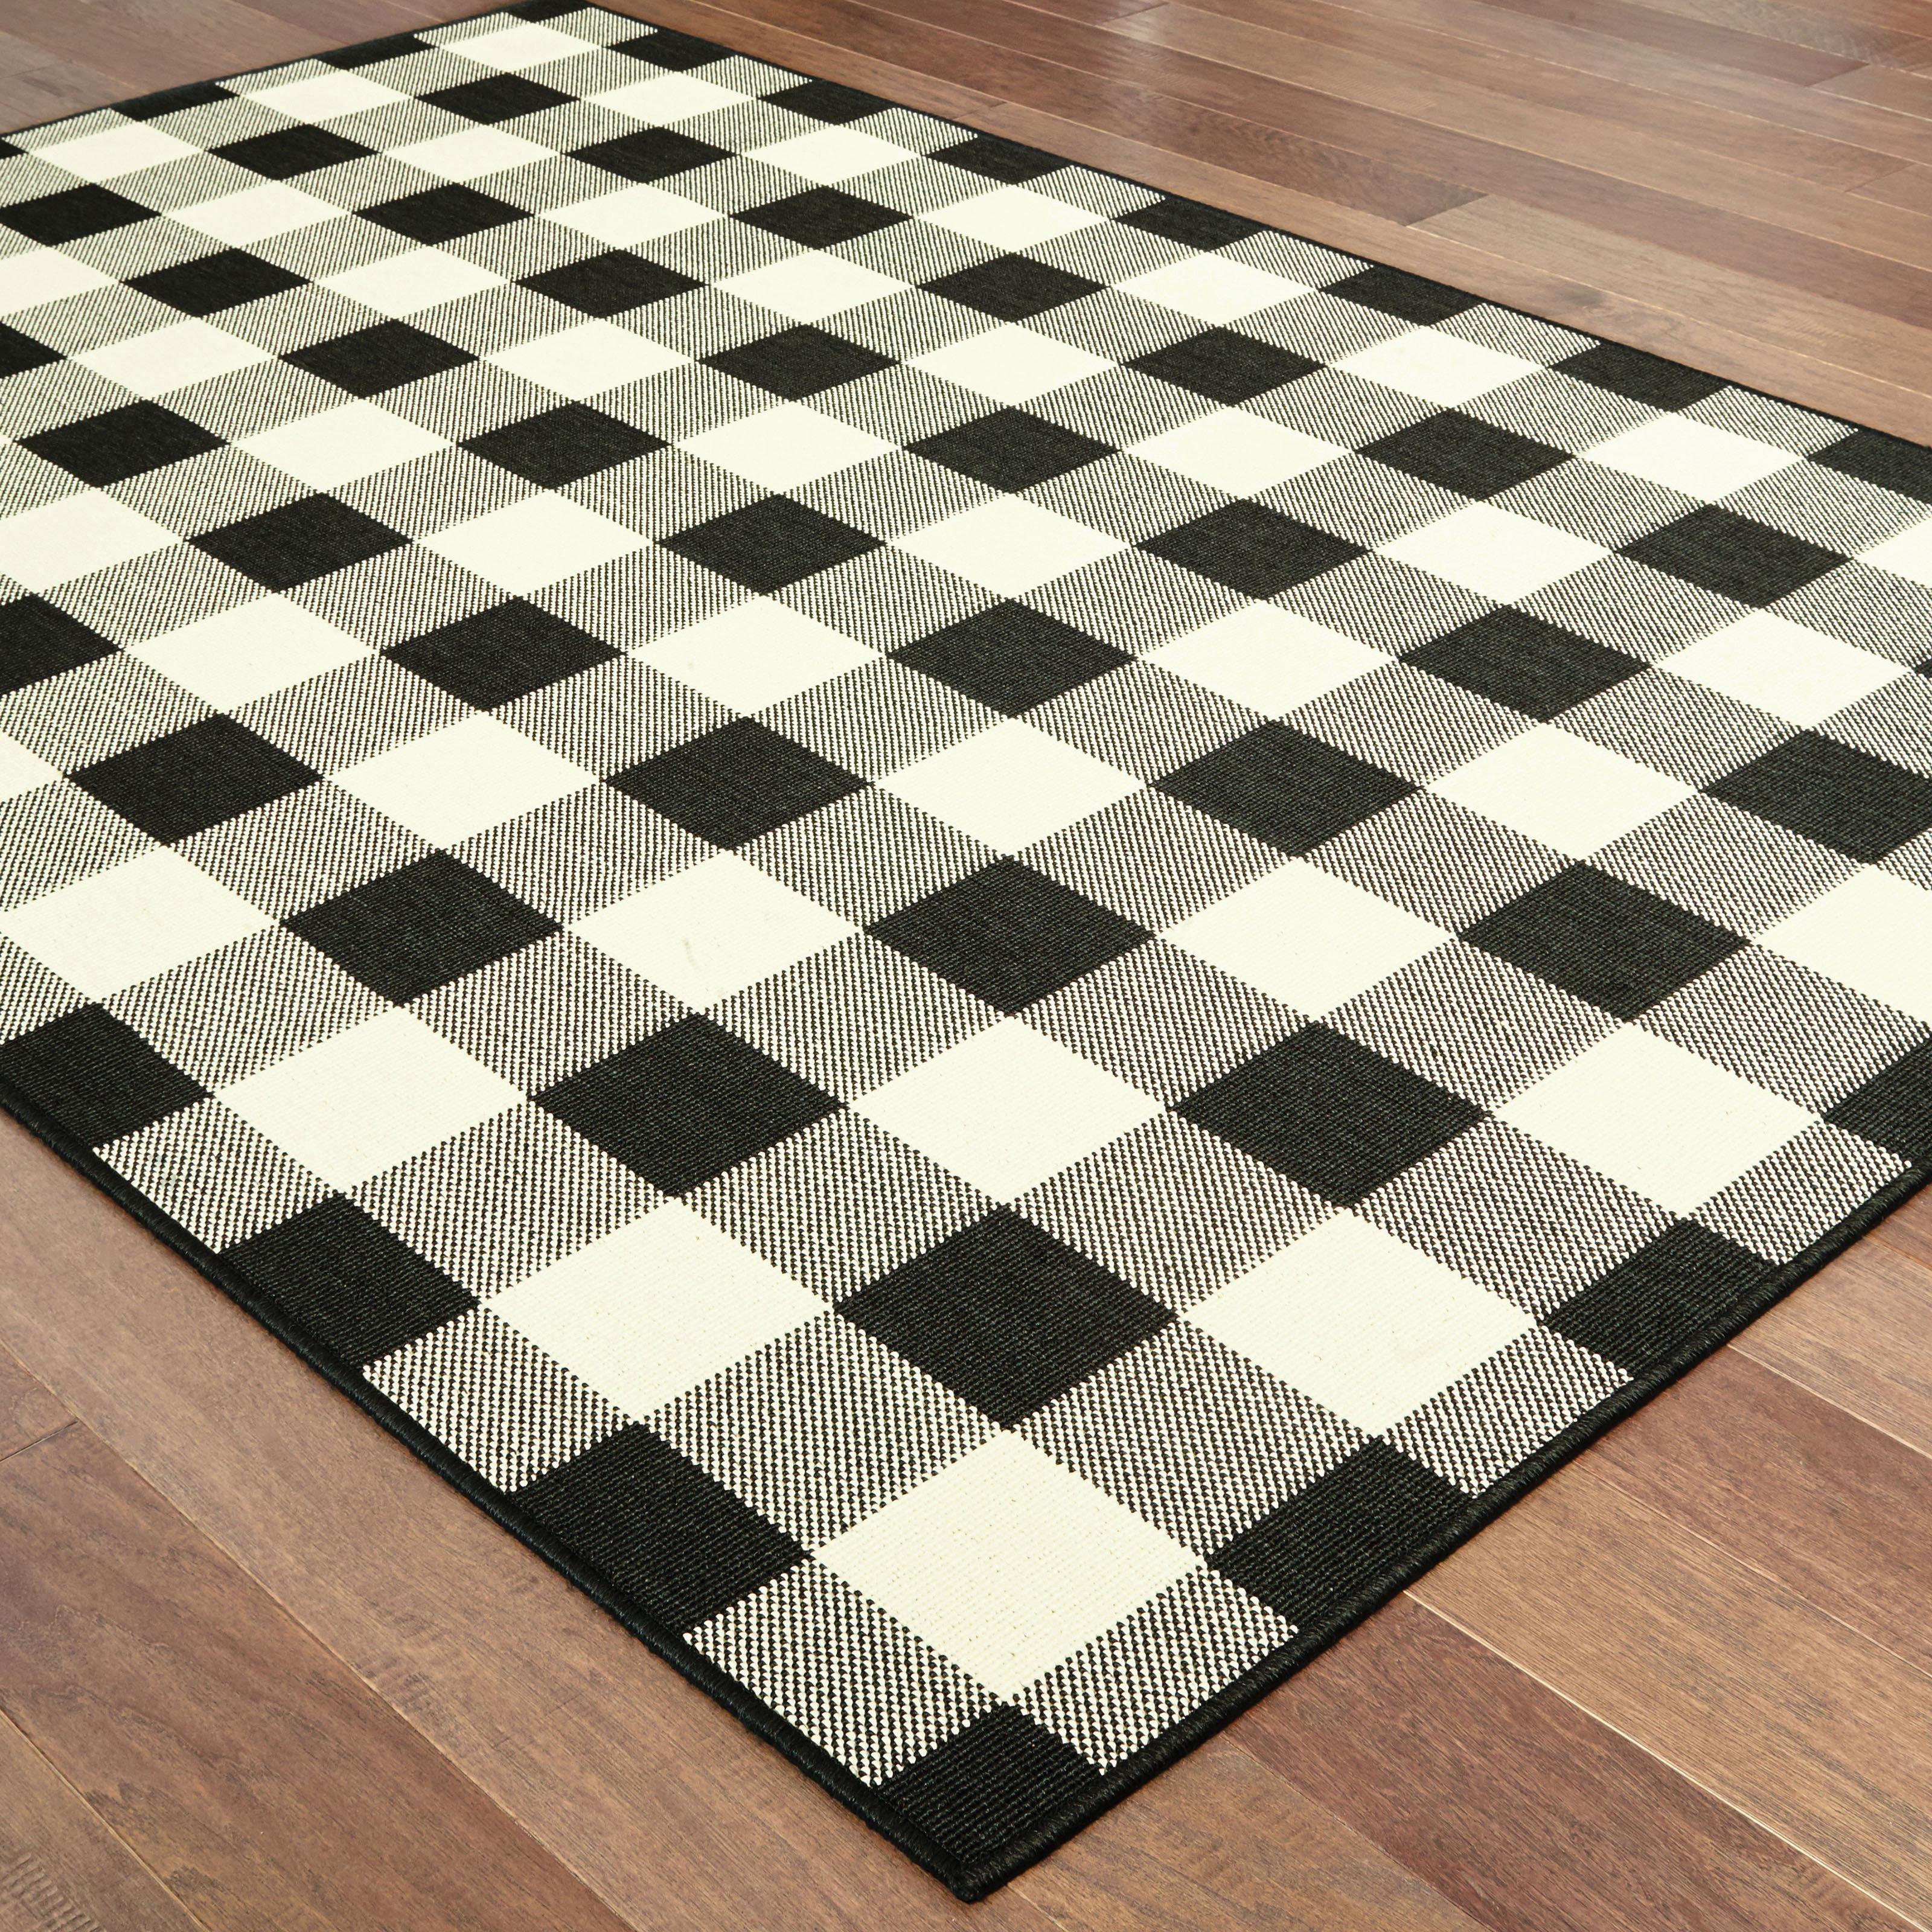 Wiest Gingham Check Blackivory Indooroutdoor Area Rug Reviews